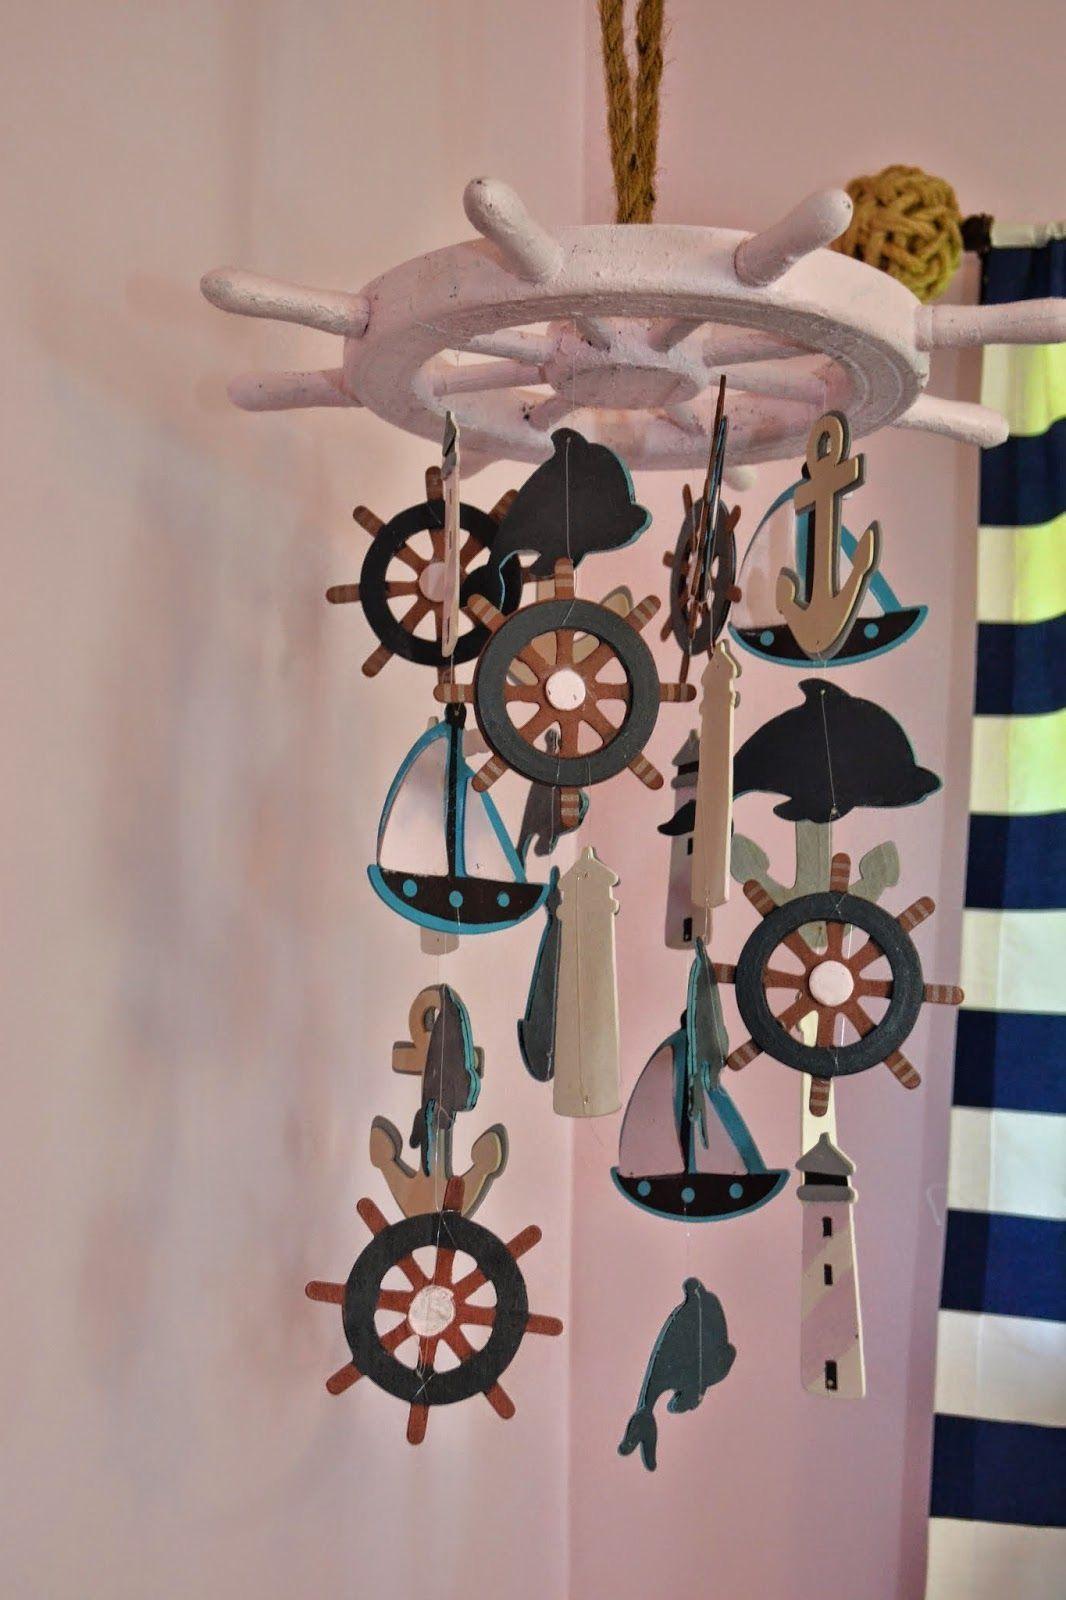 Nautical Baby Boy Nursery Room Ideas: Pin By Shanna Bolton On Grayson Thomas